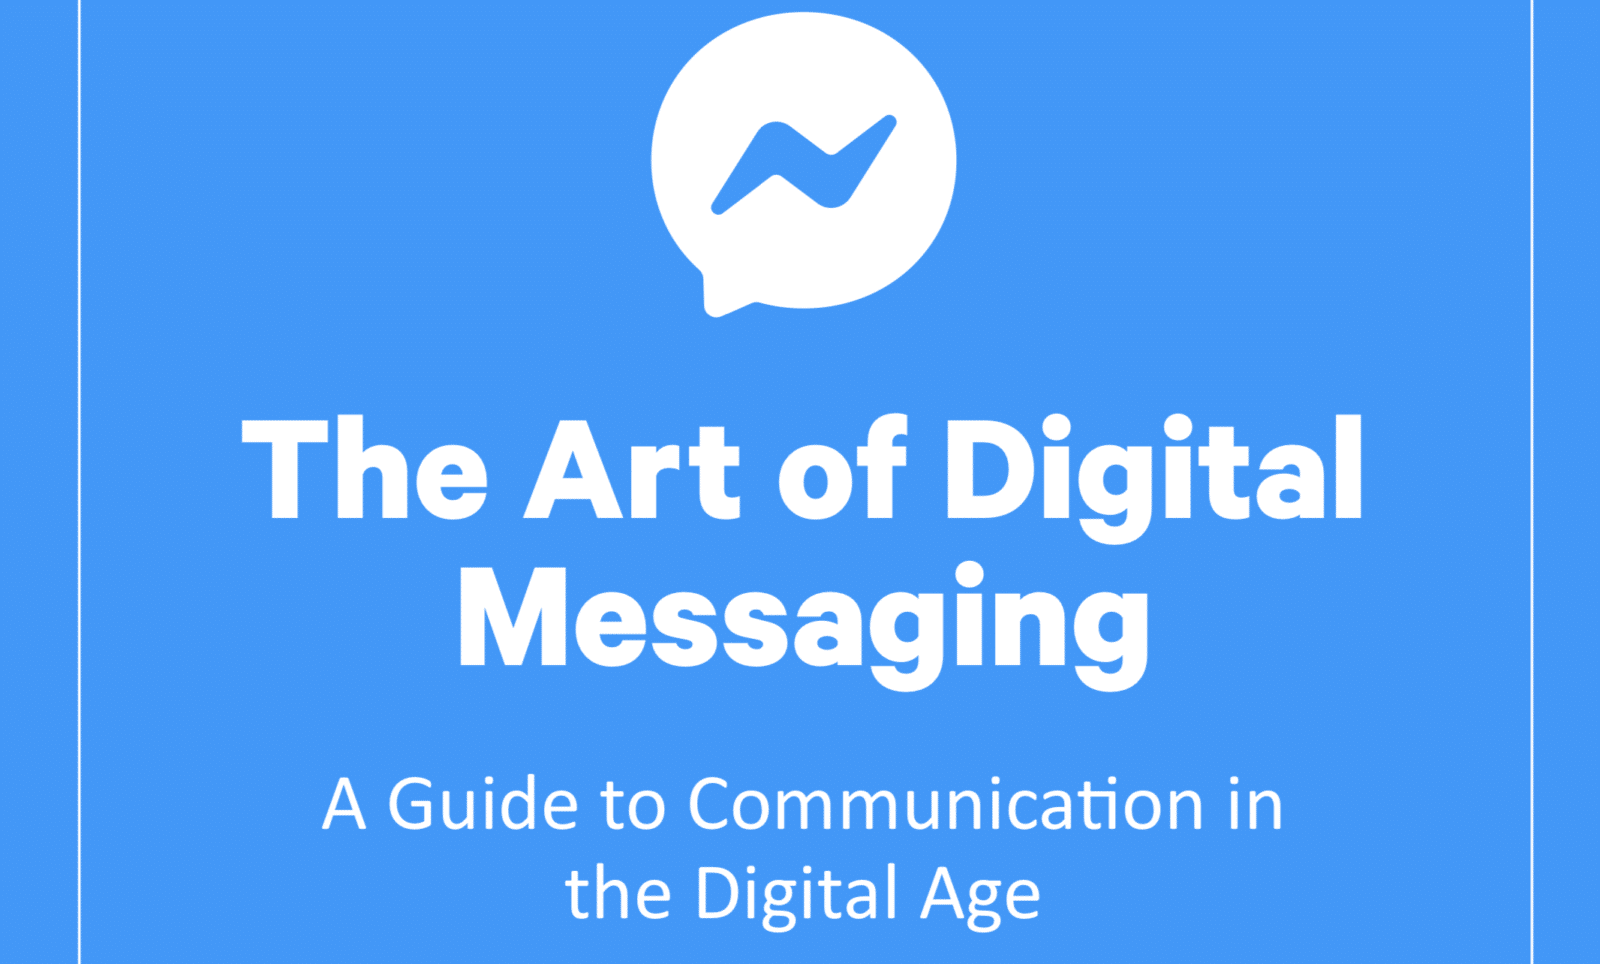 Facebook ร่วมกับสถาบันอบรมมรรยาท ออกคู่มือ 10 ข้อ เทคนิคตอบ Messenger อย่างโปร